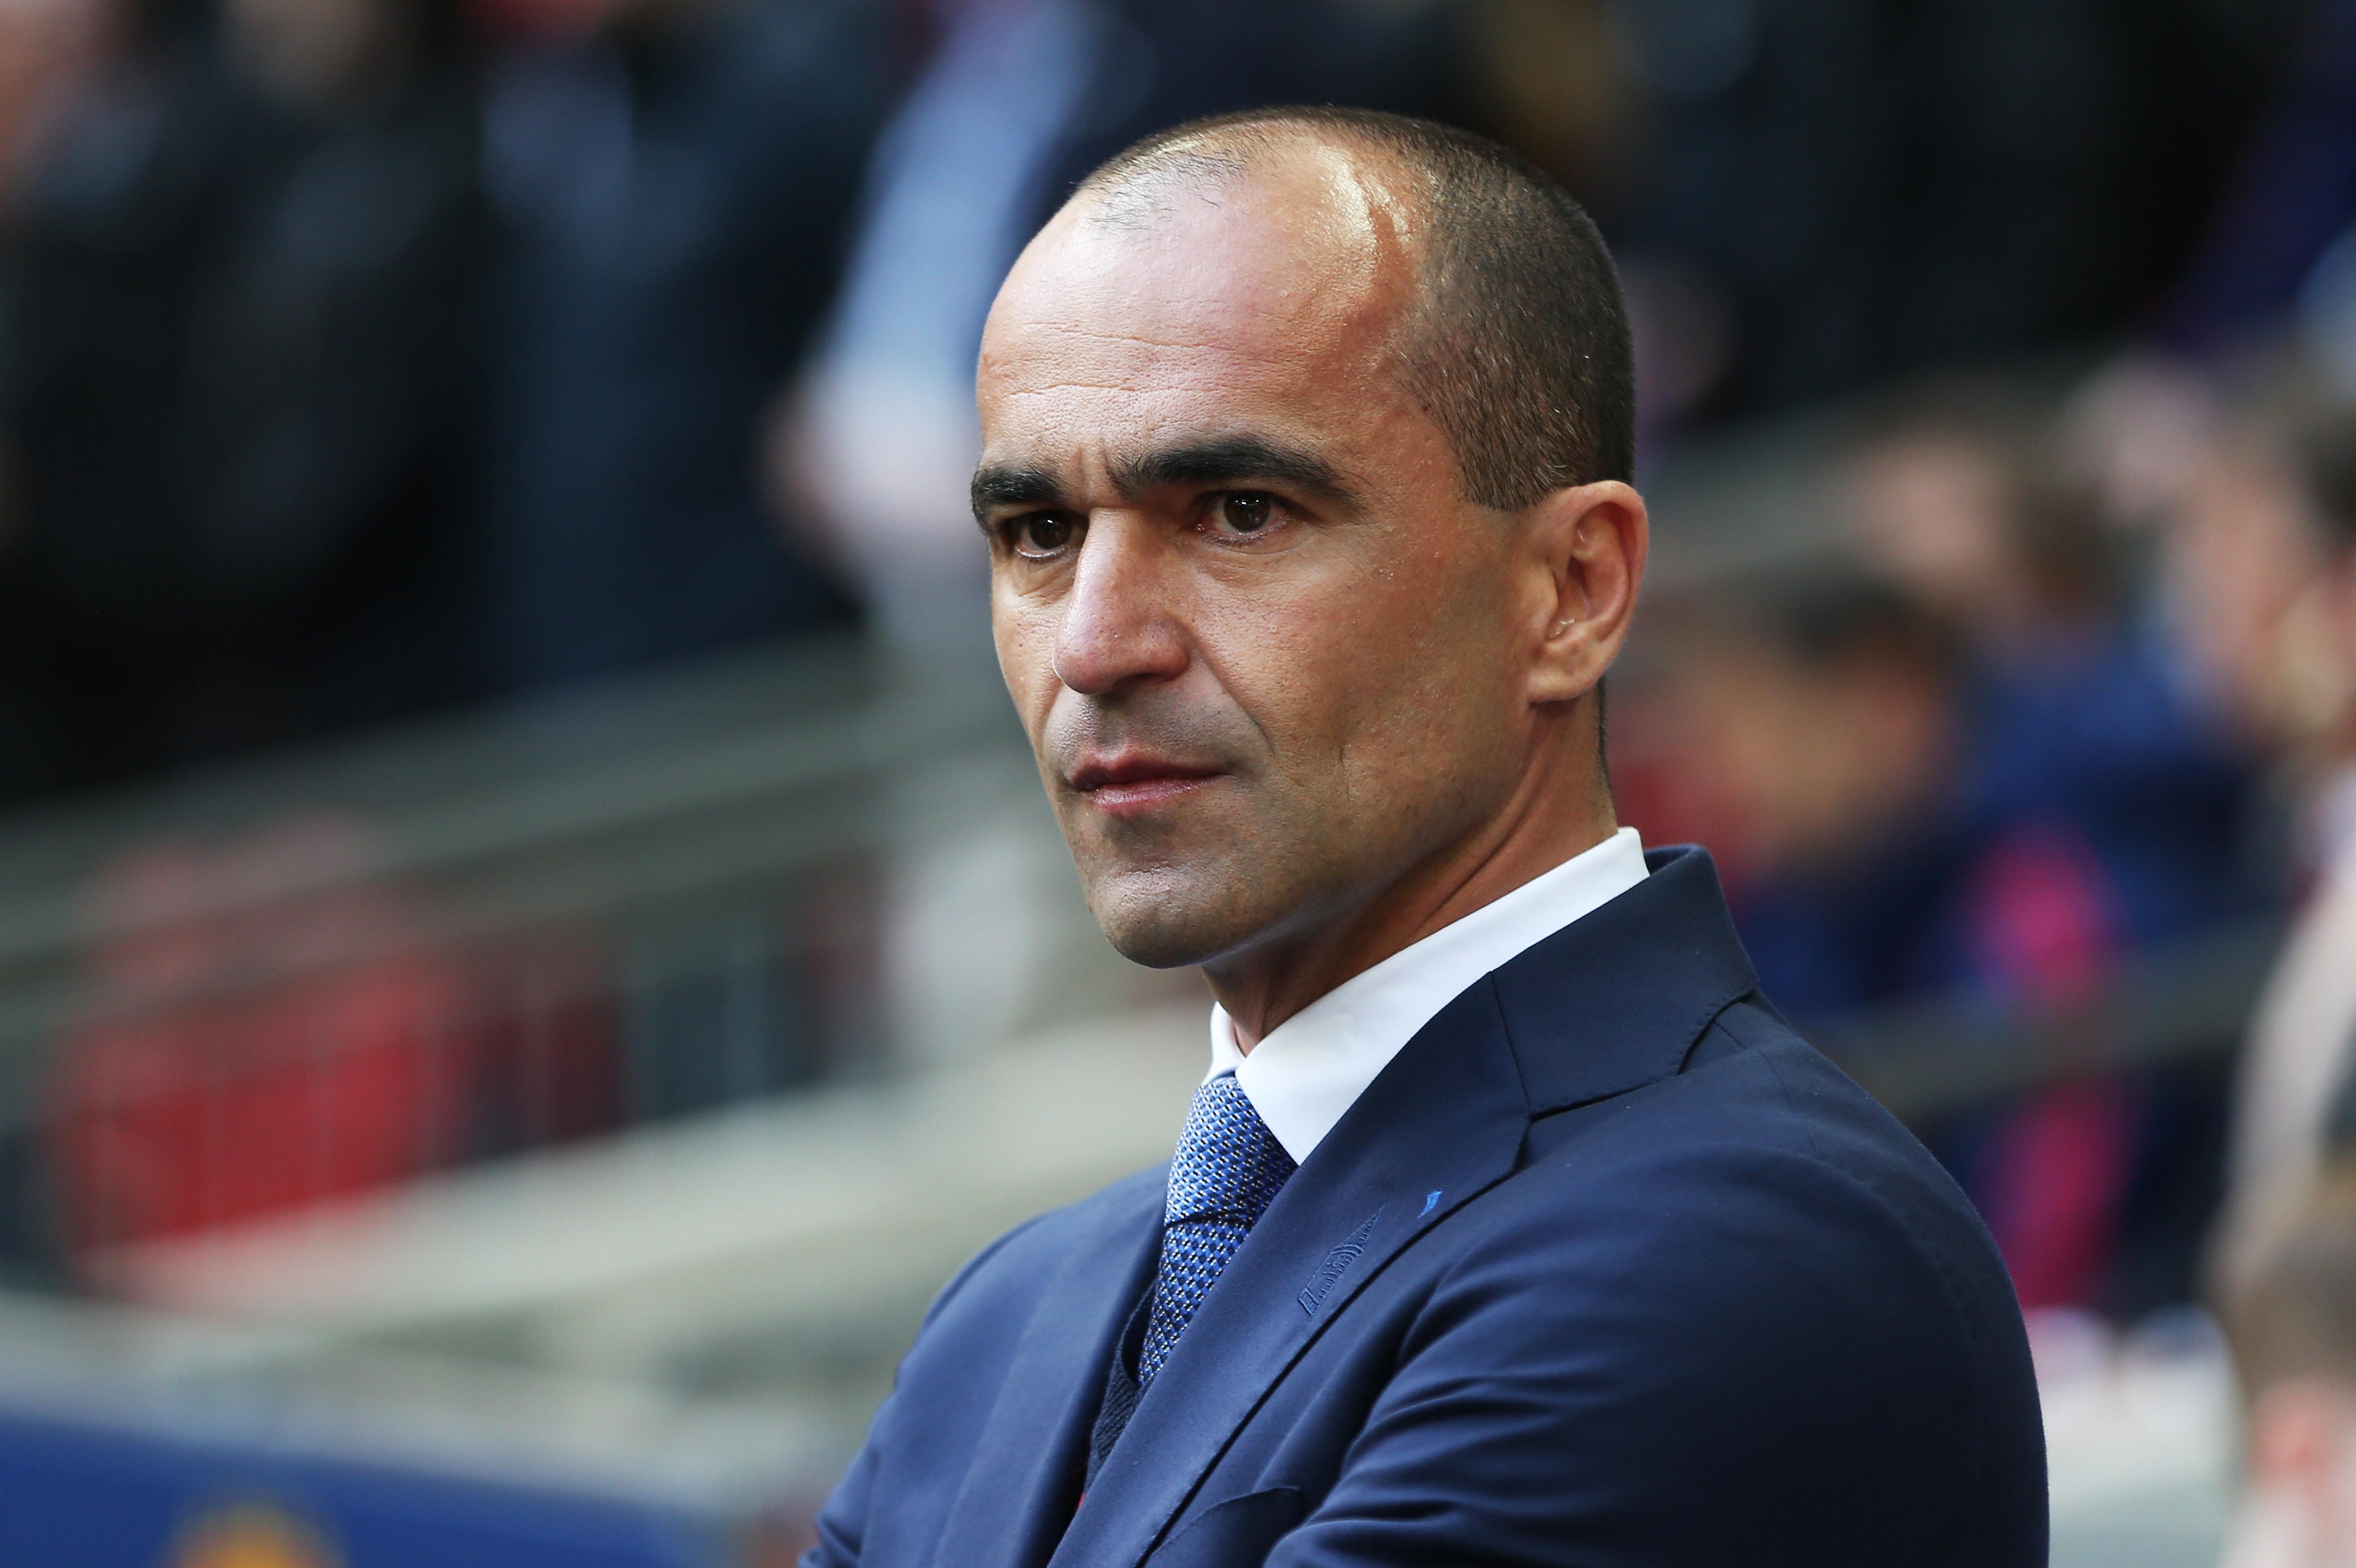 Everton draw up incredible shortlist to replace Roberto Martinez including Manuel Pellegrini and Ronald Koeman